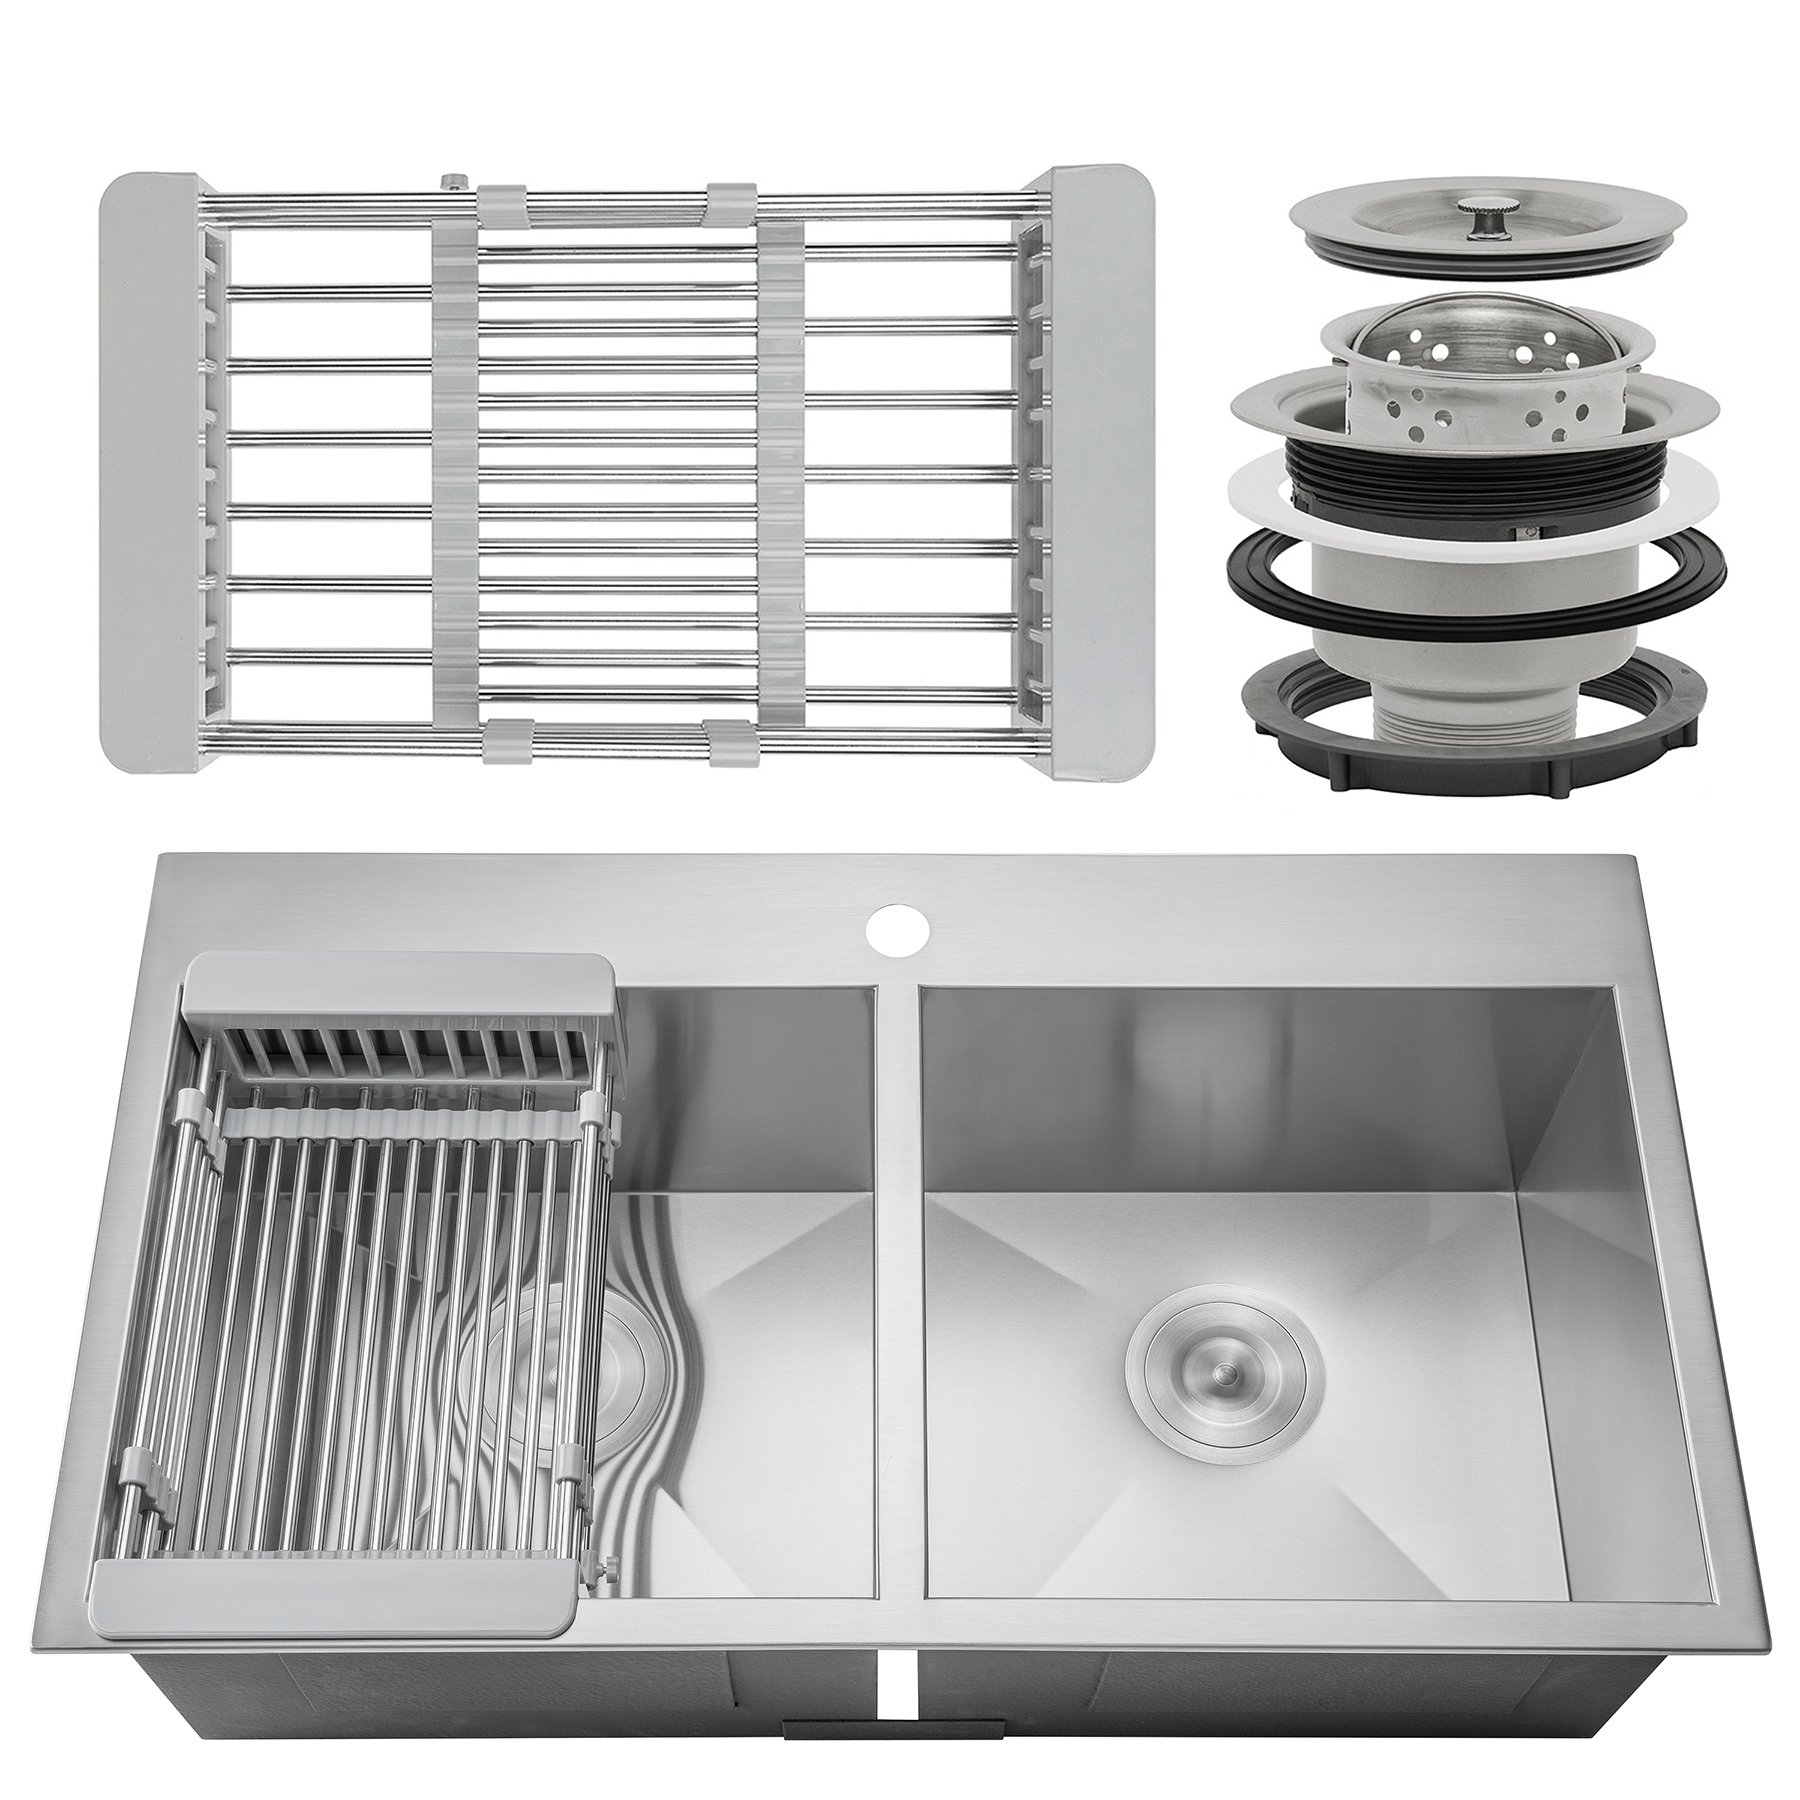 Firebird 32'' x 18'' x 9'' Handmade 18 Gauge 50/50 Double Bowl Basin Topmount Drop-in Kitchen Sink w/ Adjustable Dish Tray & Strainer by Fire Bird